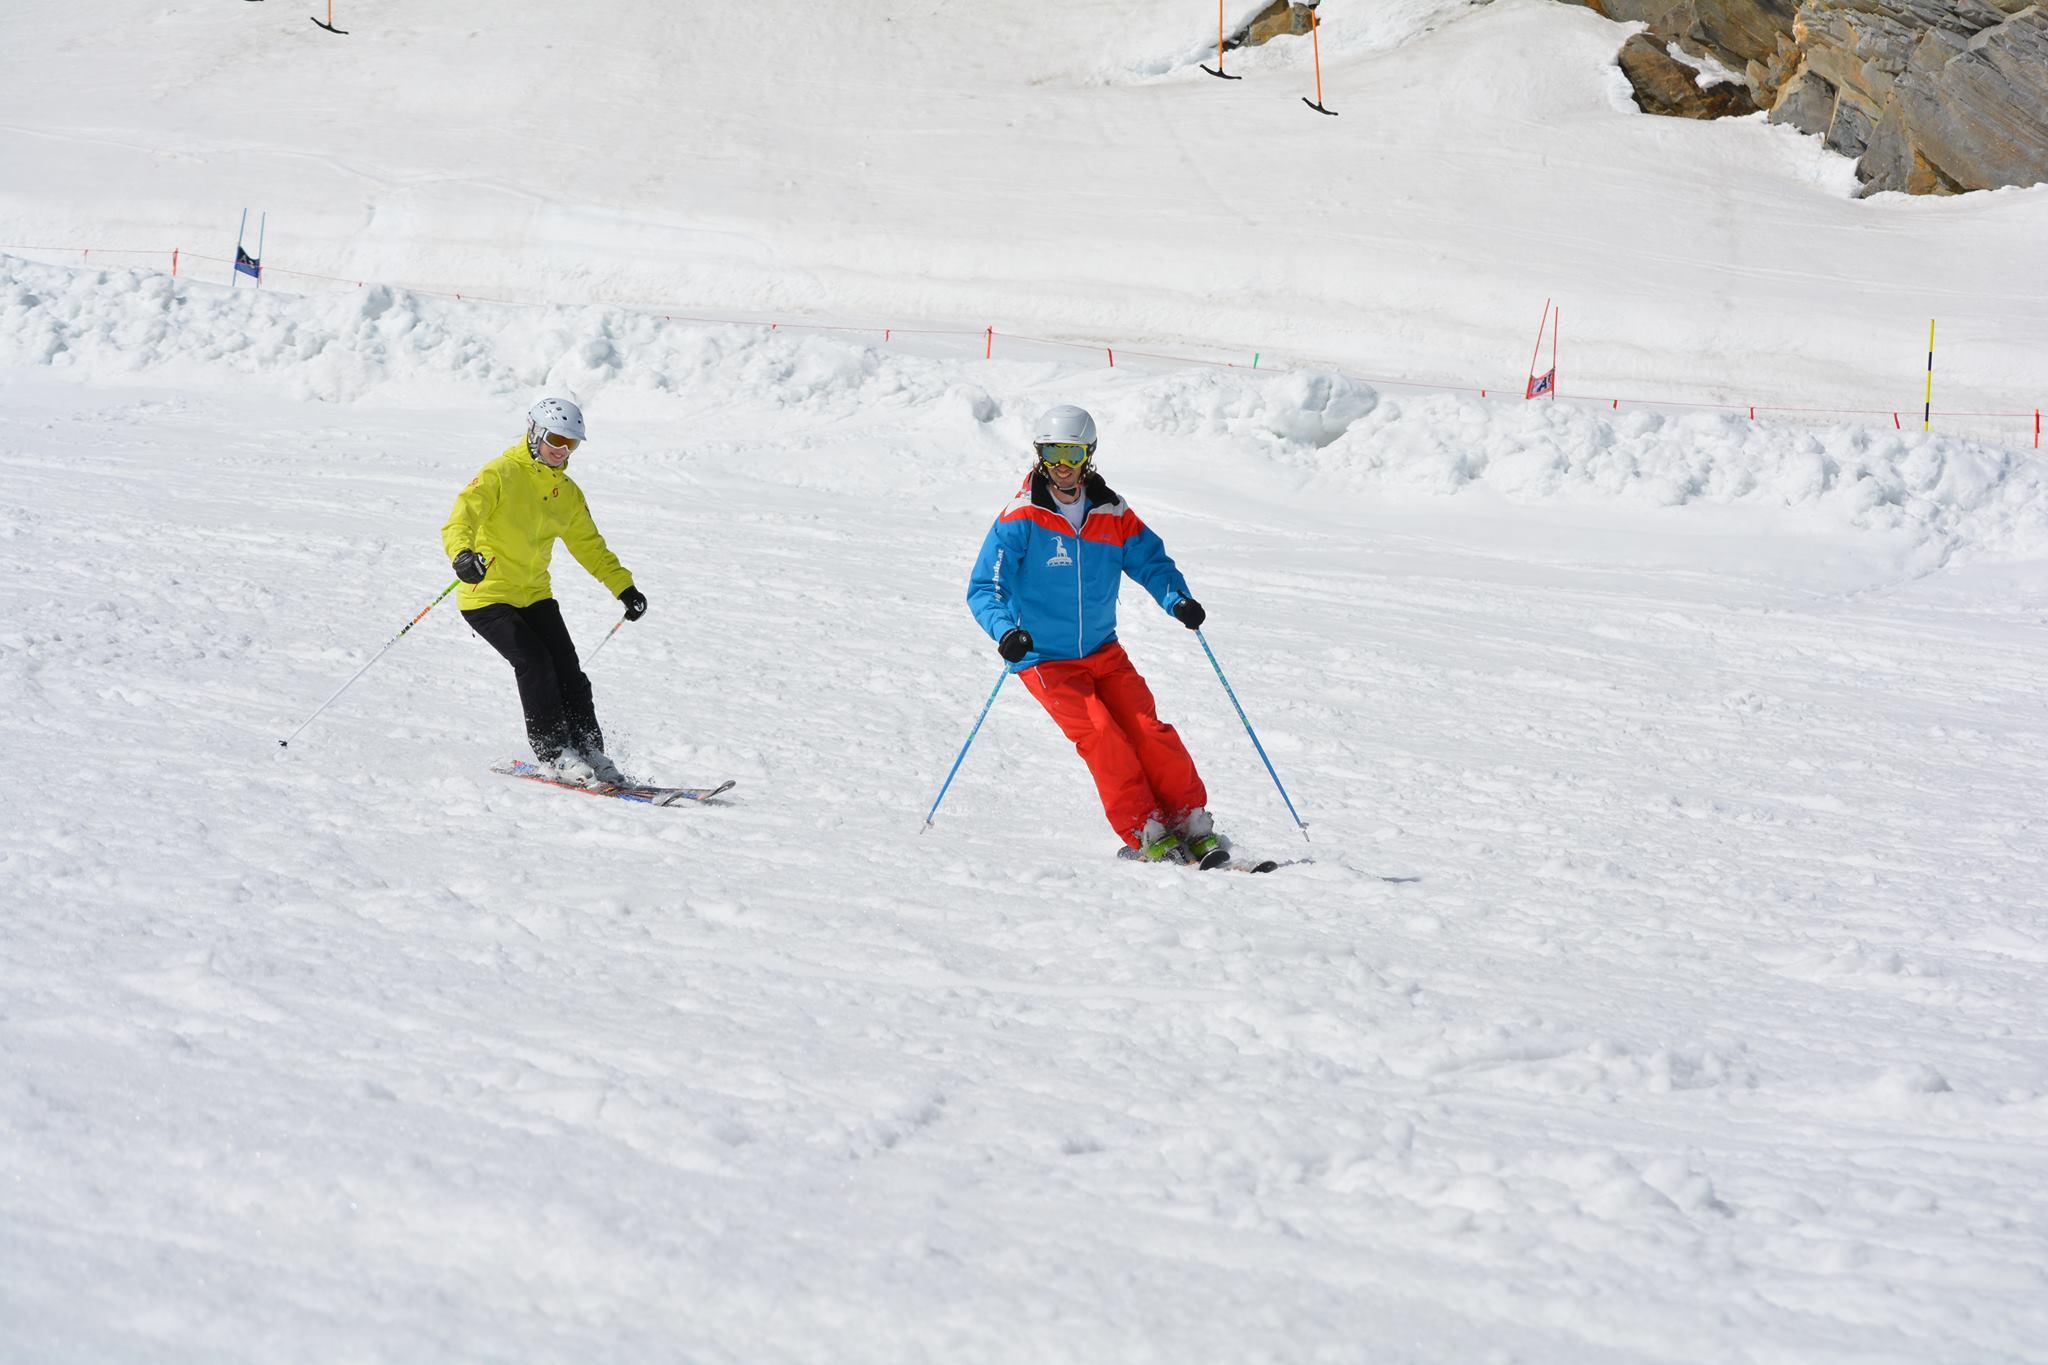 Skilessen voor volwassenen - Licht gevorderden